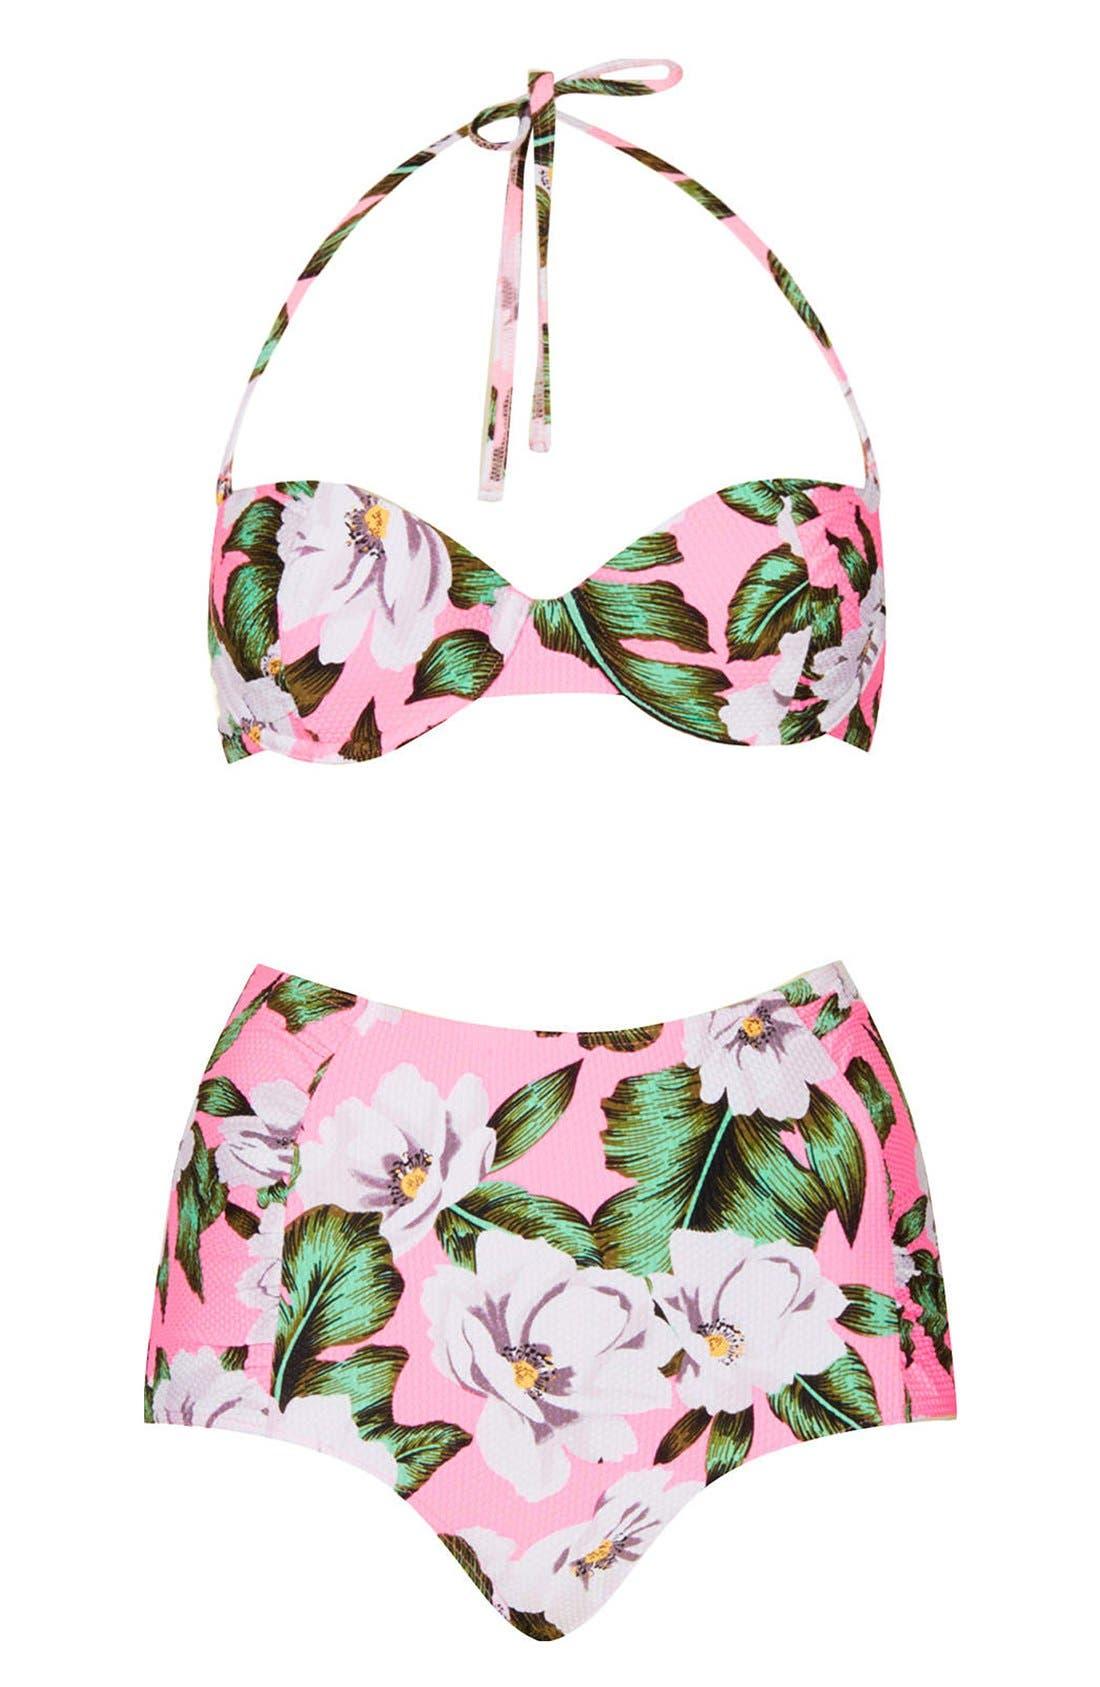 Main Image - Topshop 'Aloha' Print Floral Bikini